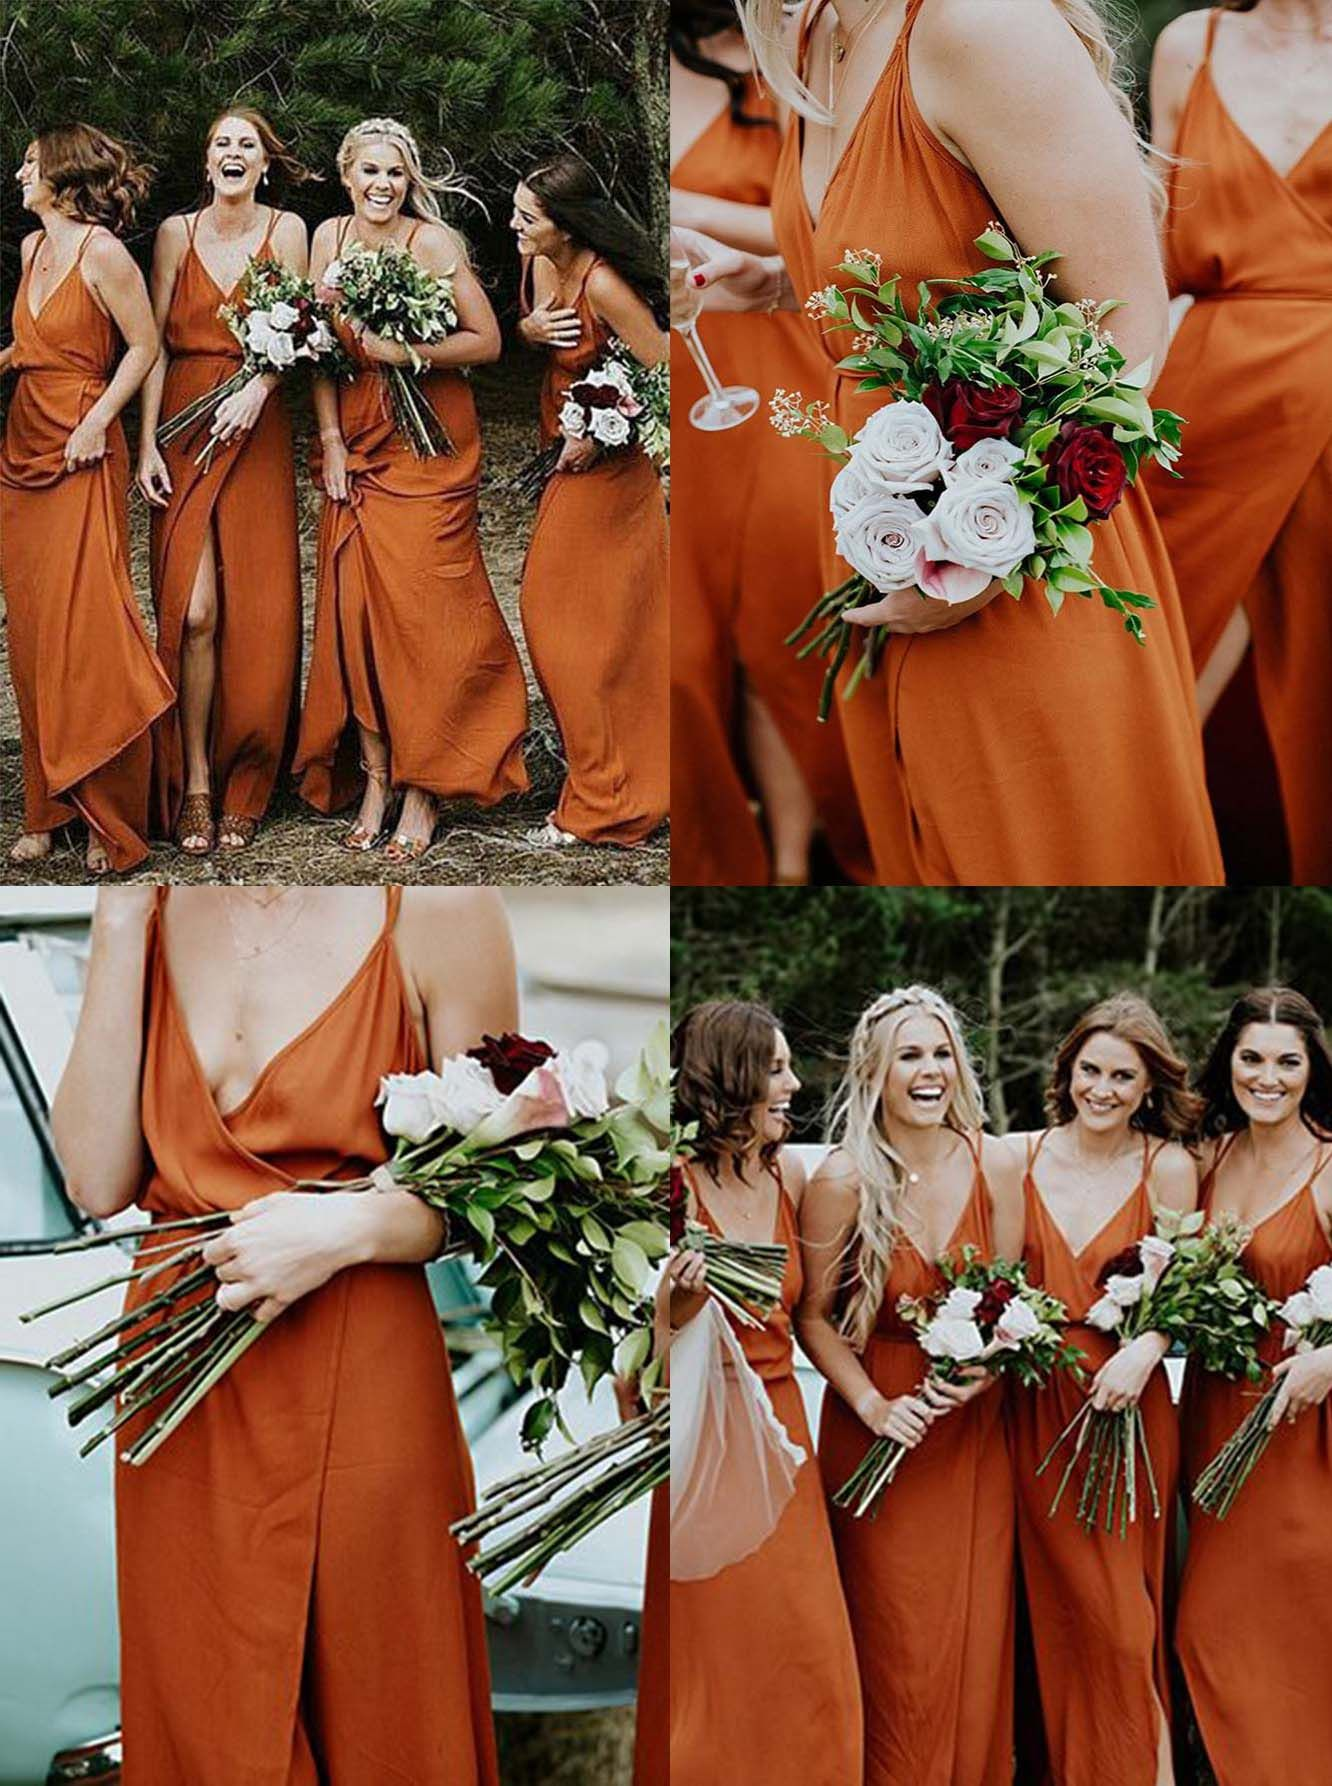 A Line V Neck Orange Chiffon Bridesmaid Dress With Split Orange Bridesmaid Dresses Orange Chiffon Bridesmaid Dress Burnt Orange Bridesmaid Dresses [ 1786 x 1332 Pixel ]